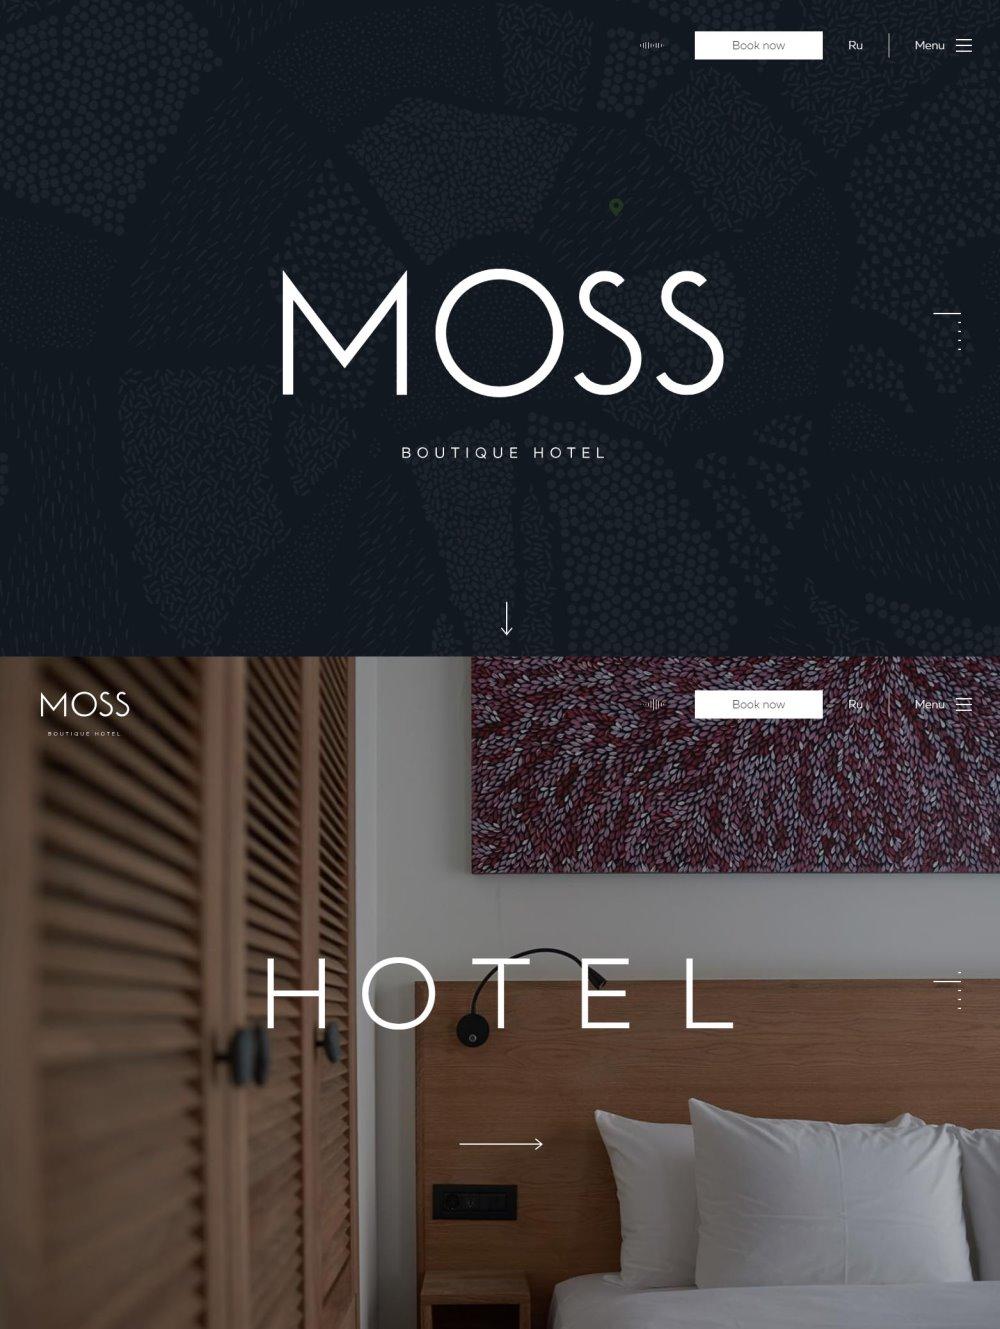 Best Hotel Website Designs